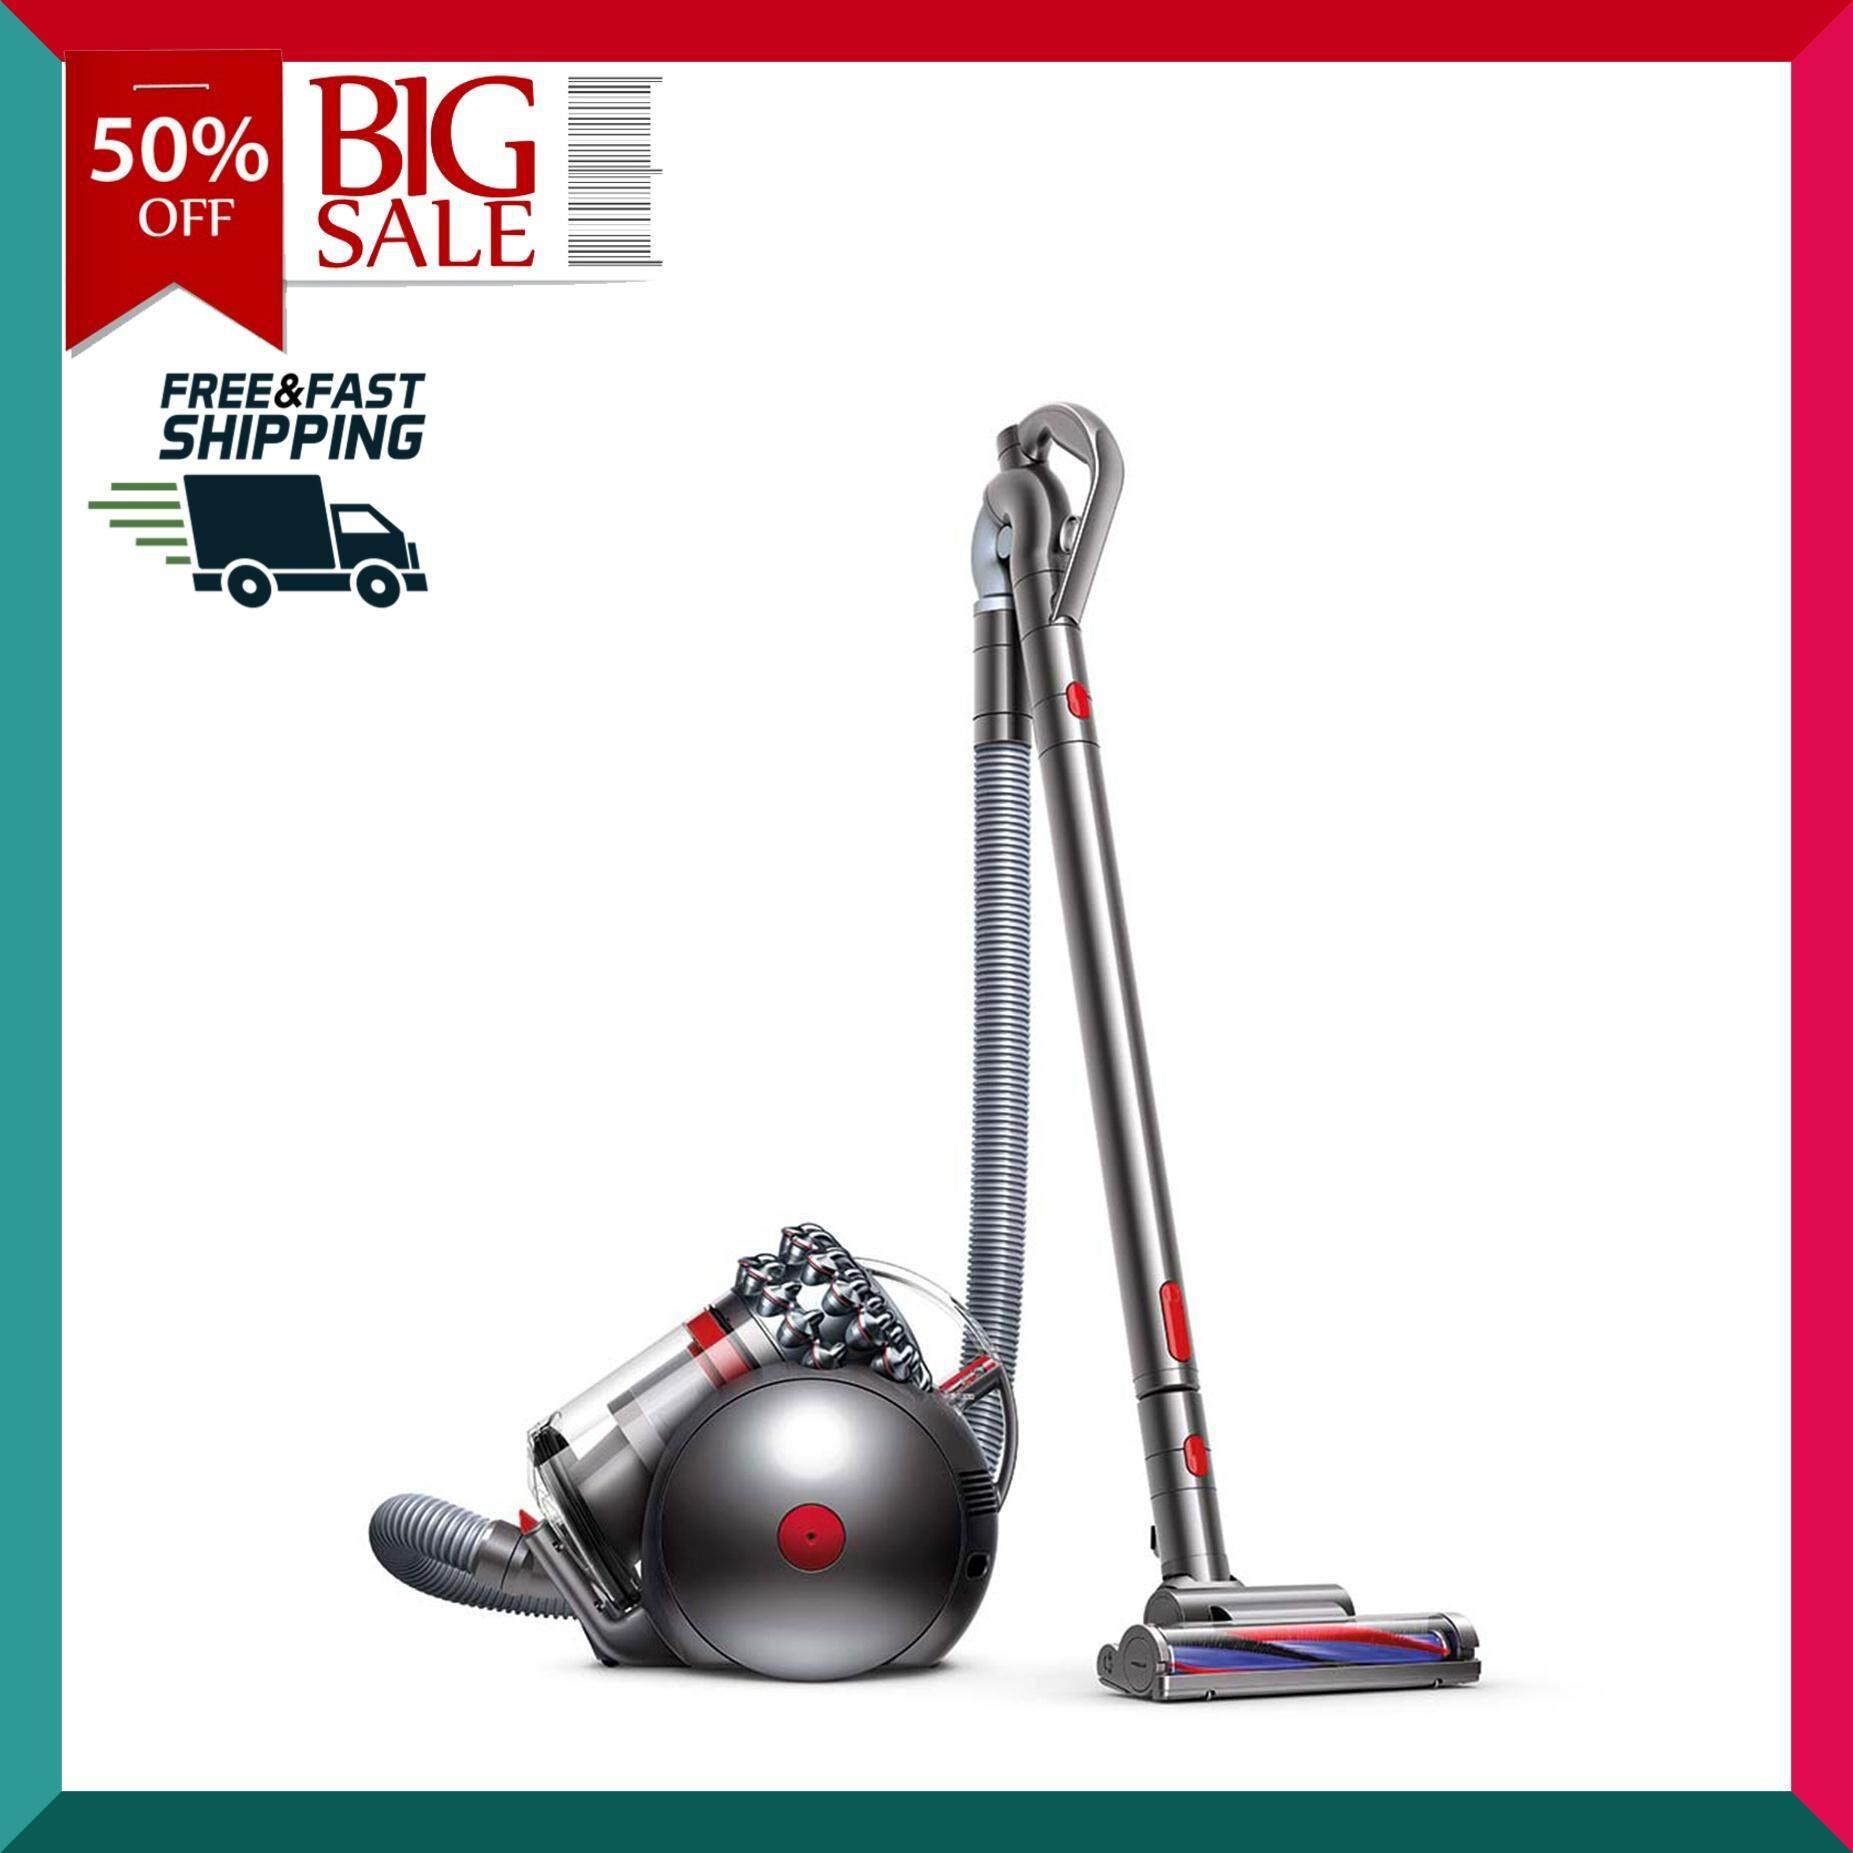 DYSON เครื่องดูดฝุ่นไซโคลน รุ่น CY22 เครื่องดูดฝุ่นอัตโนมัติ หุ่นยนต์ดูดฝุ่น เครื่องดูดฝุ่น เครื่องทำความสะอาด Vacuum Cleaner สินค้าคุณภาพ Premium !!! จัดส่งฟรี